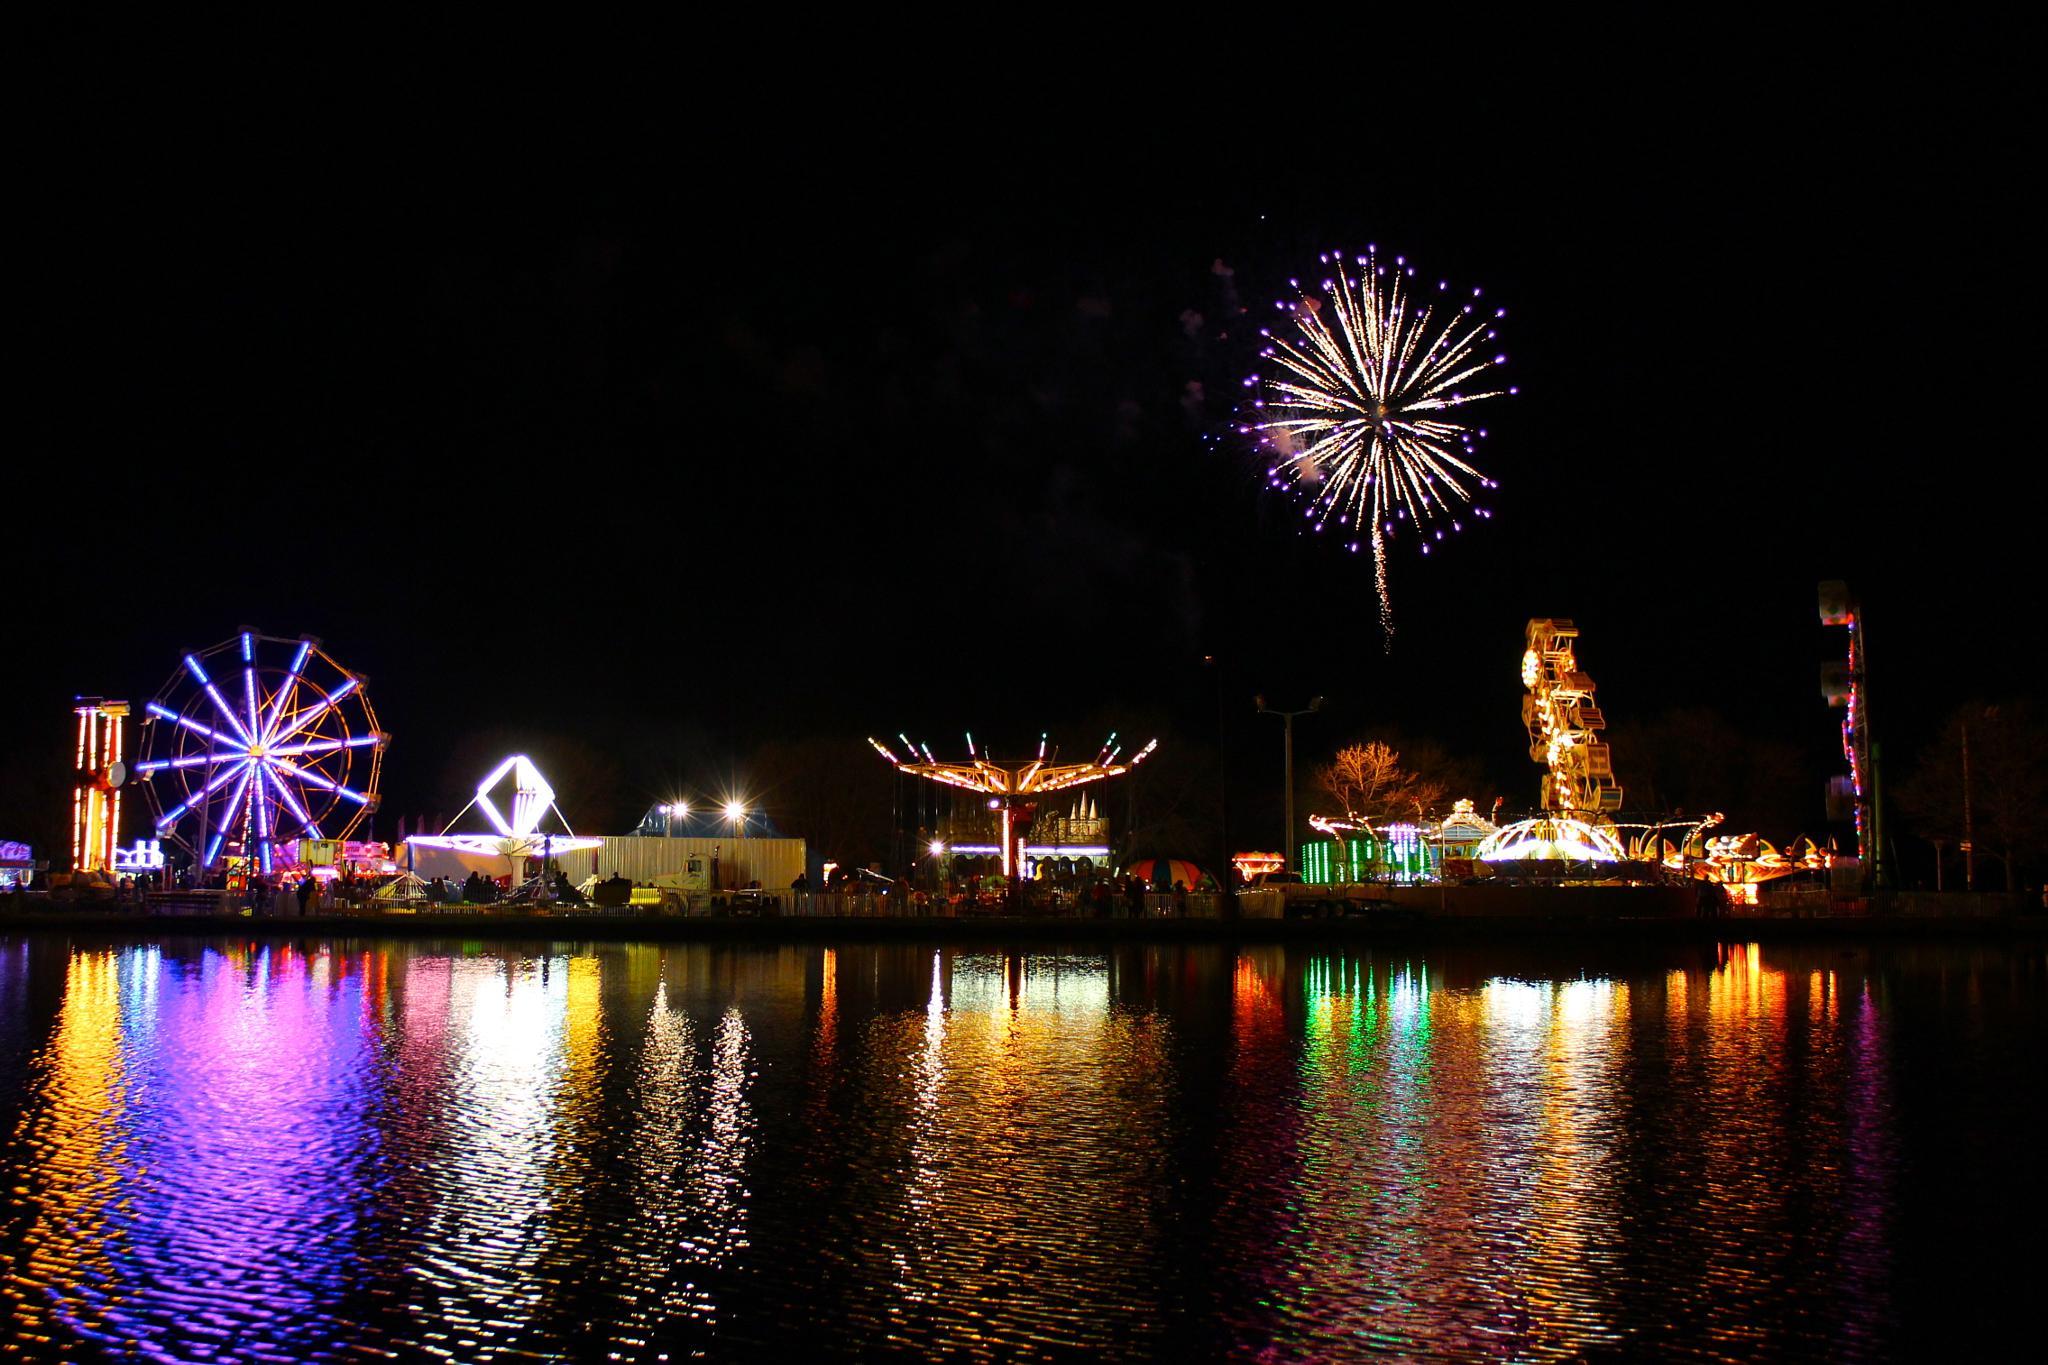 Purple Carnival Fireworks by heidi.croddick